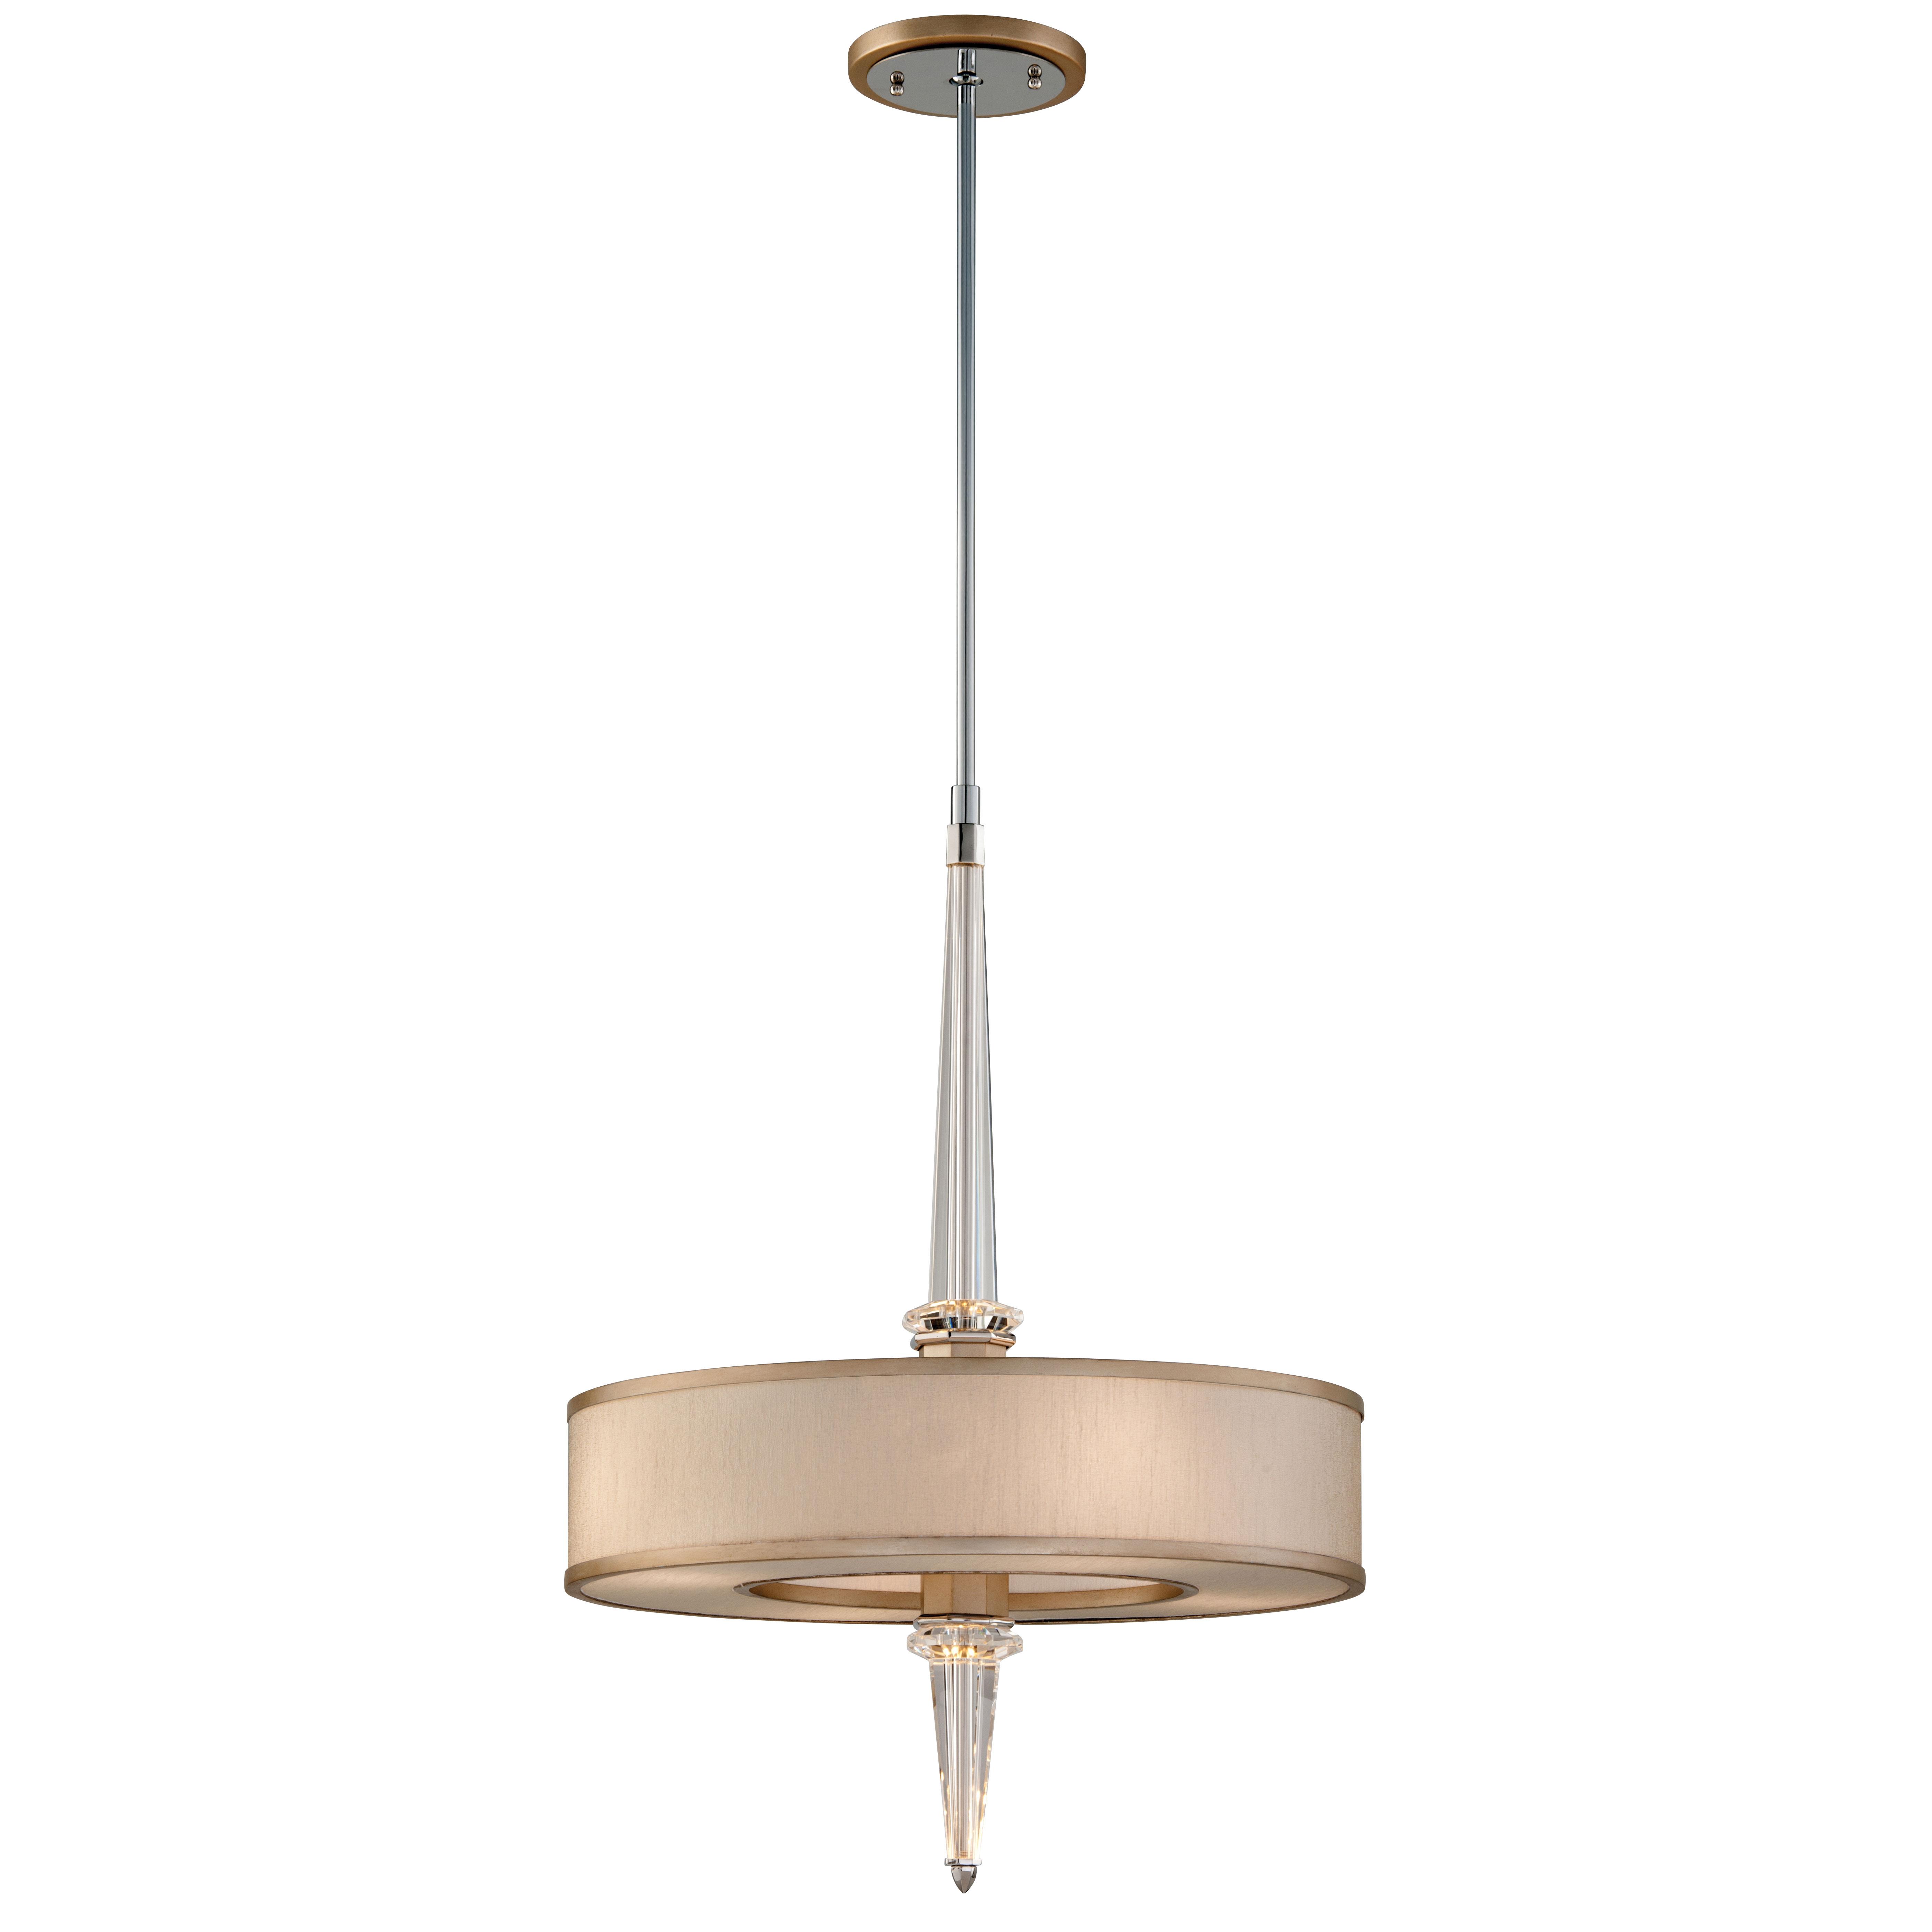 corbettlighting. harlow pendant by corbett lighting | 166-44 corbettlighting